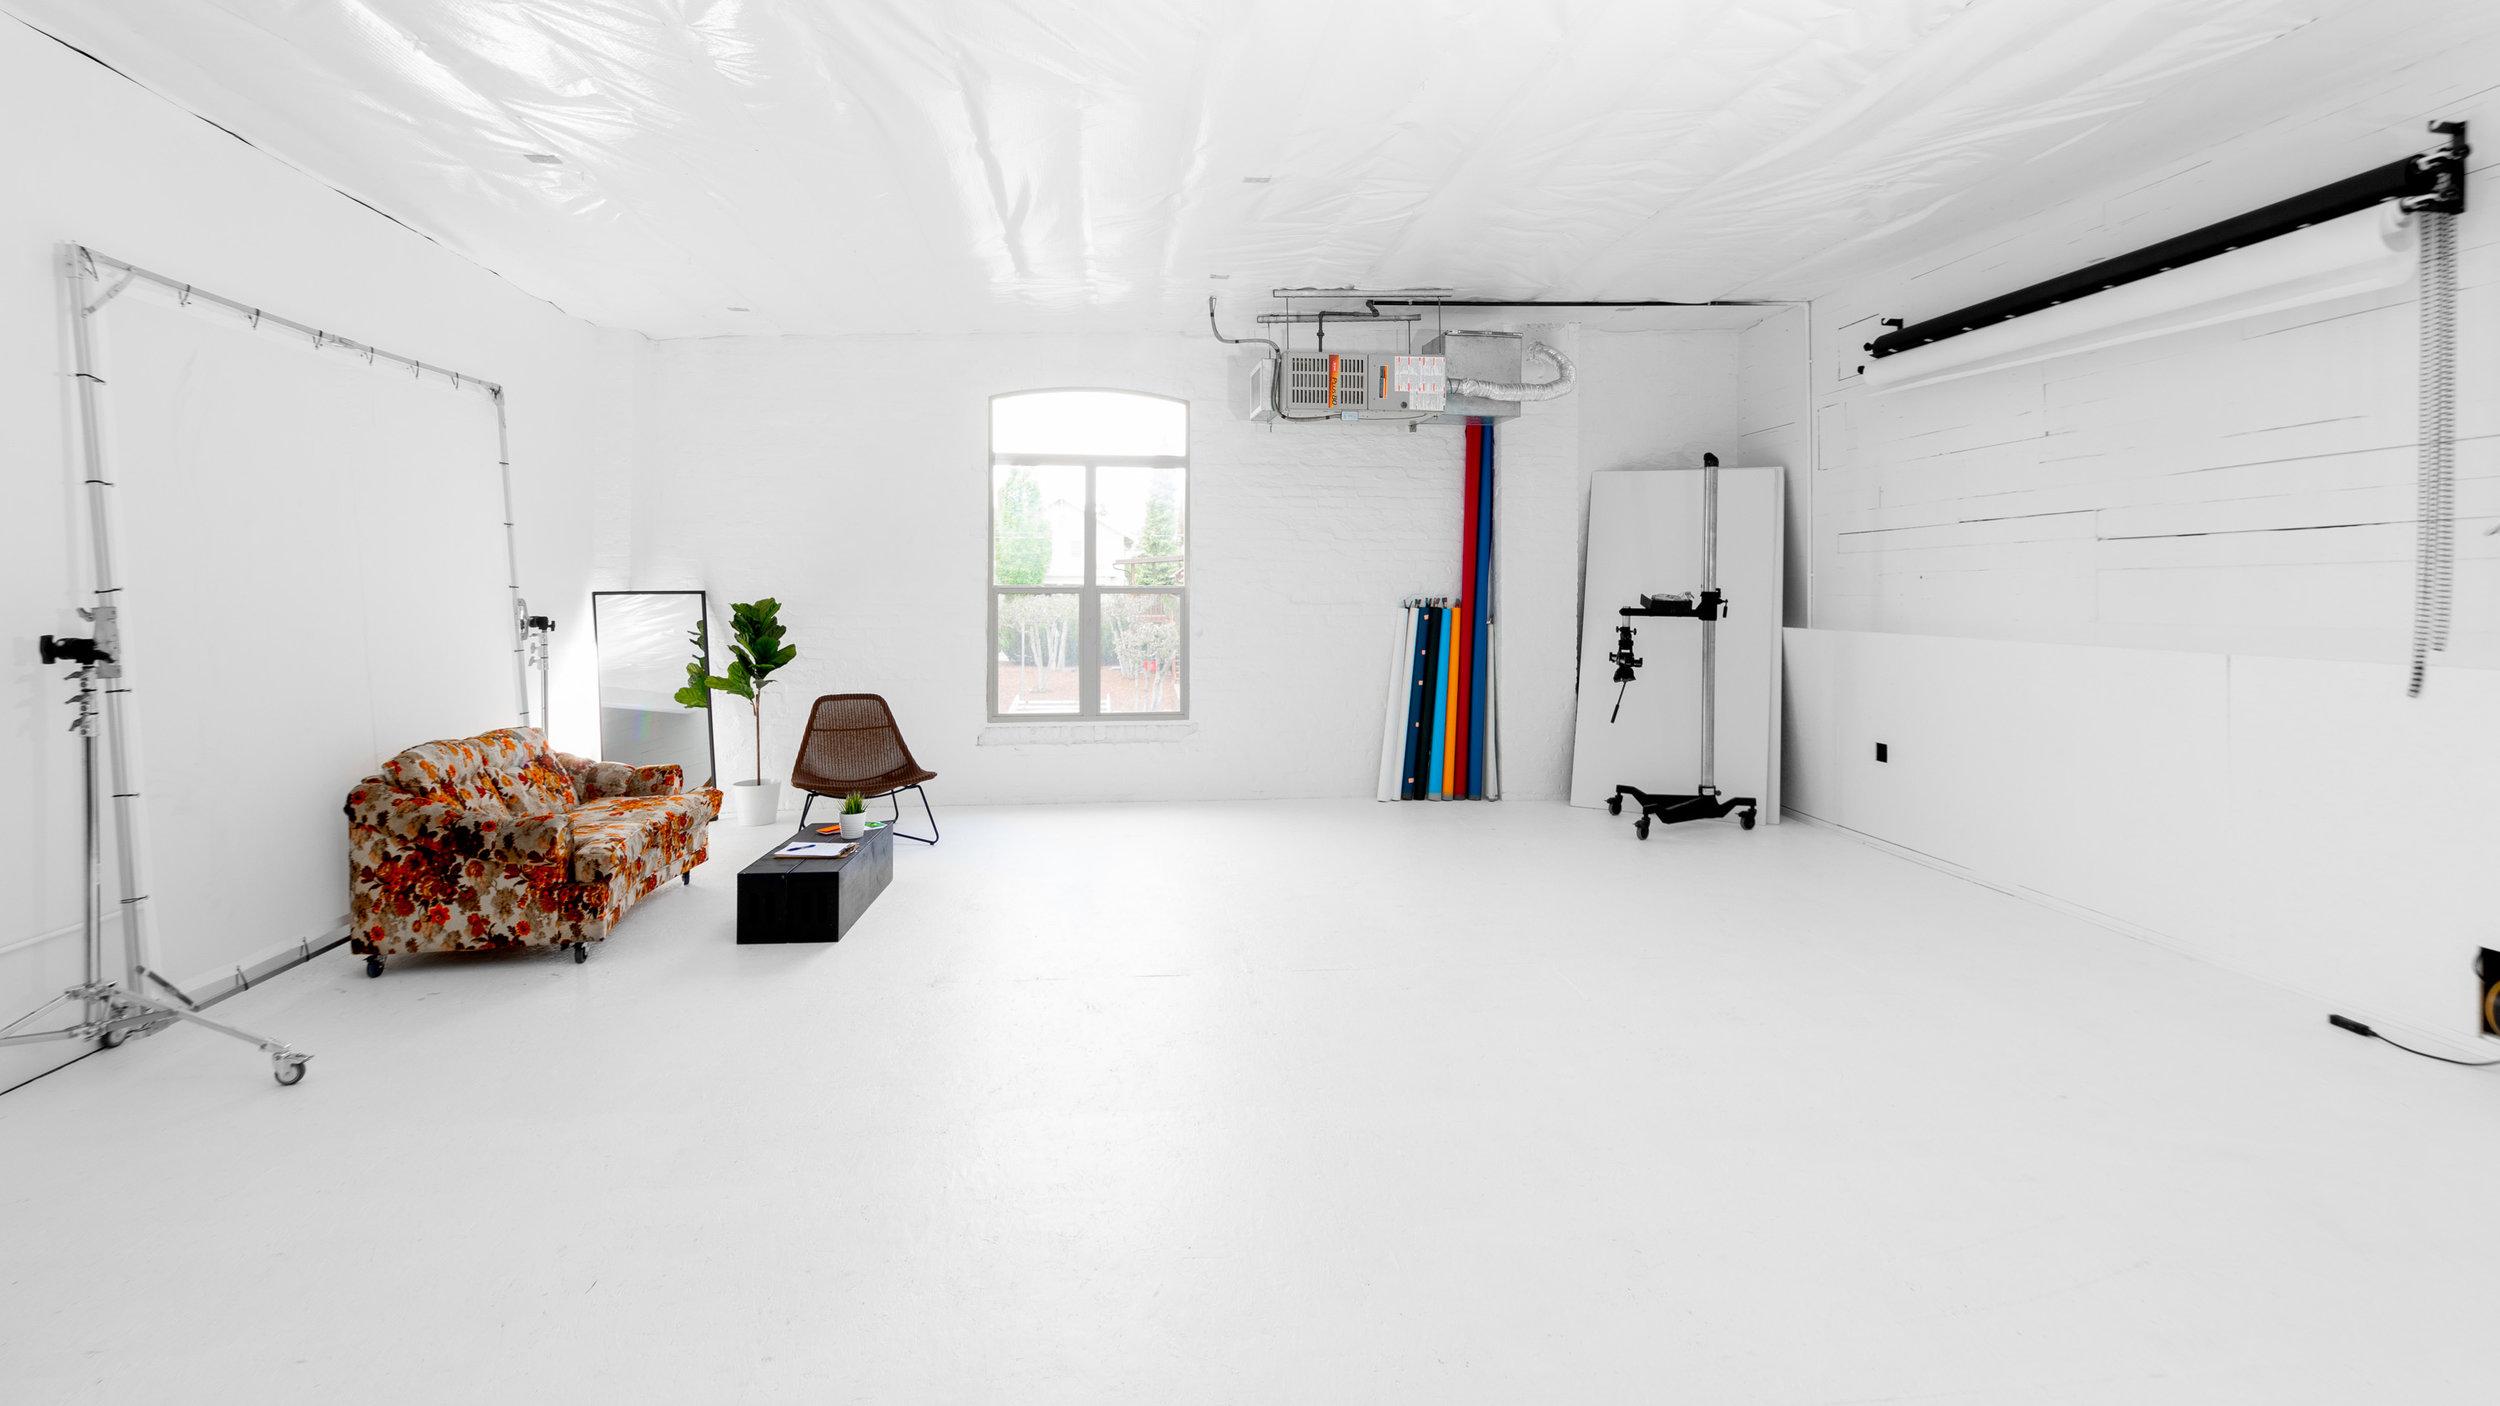 spencer wallace photo studio rental video-1 copy.jpg